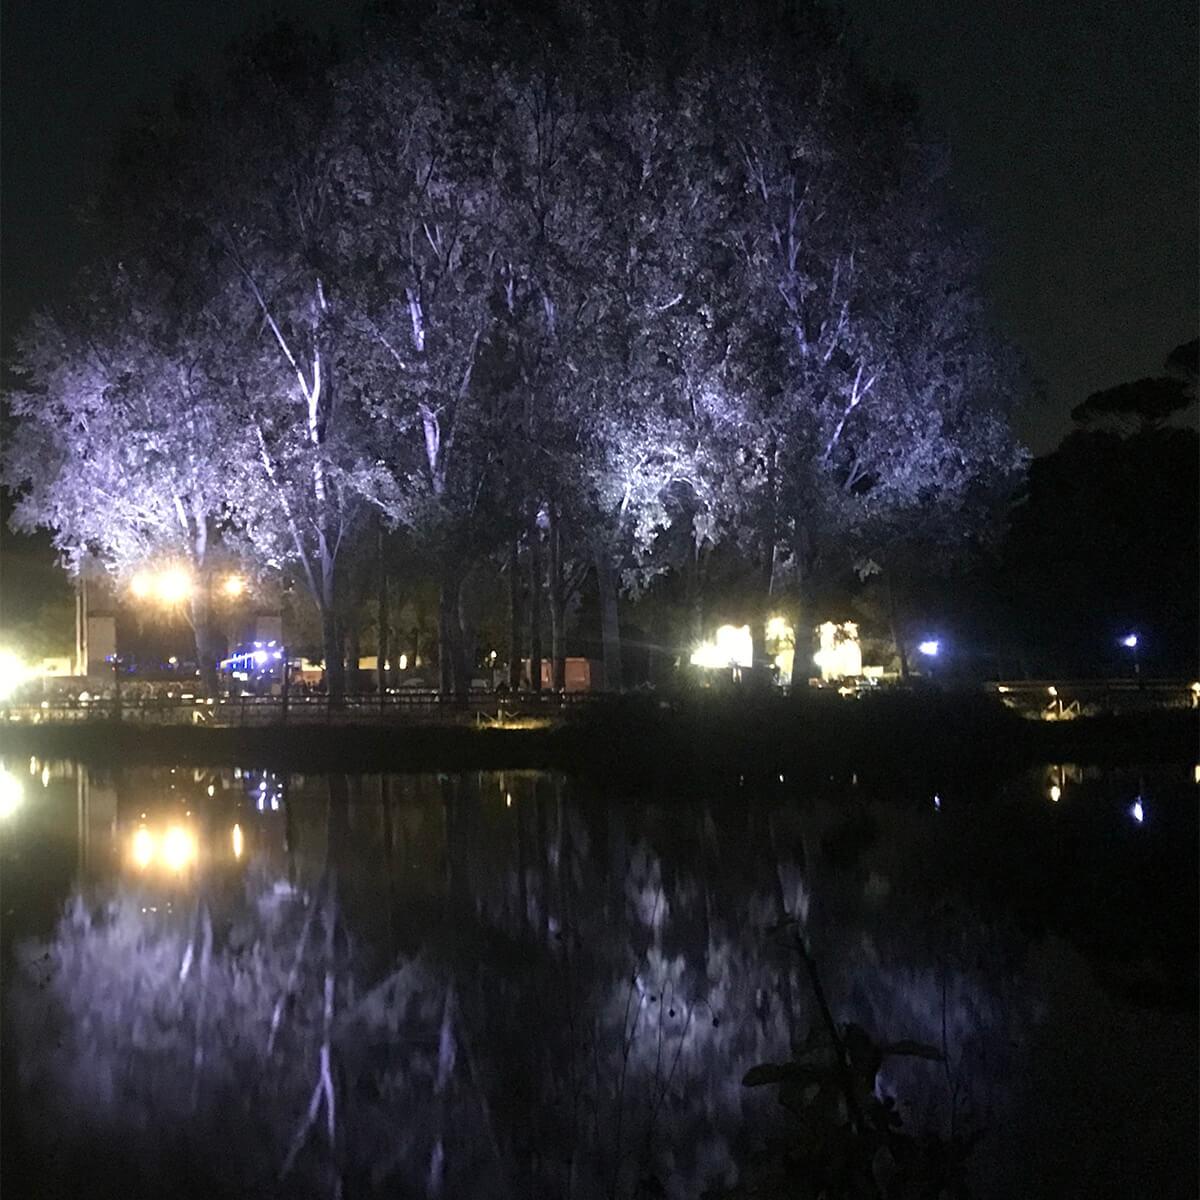 Burningmax: Breathe | Art installation | Villa Ada lake, Rome Italy | Installation details